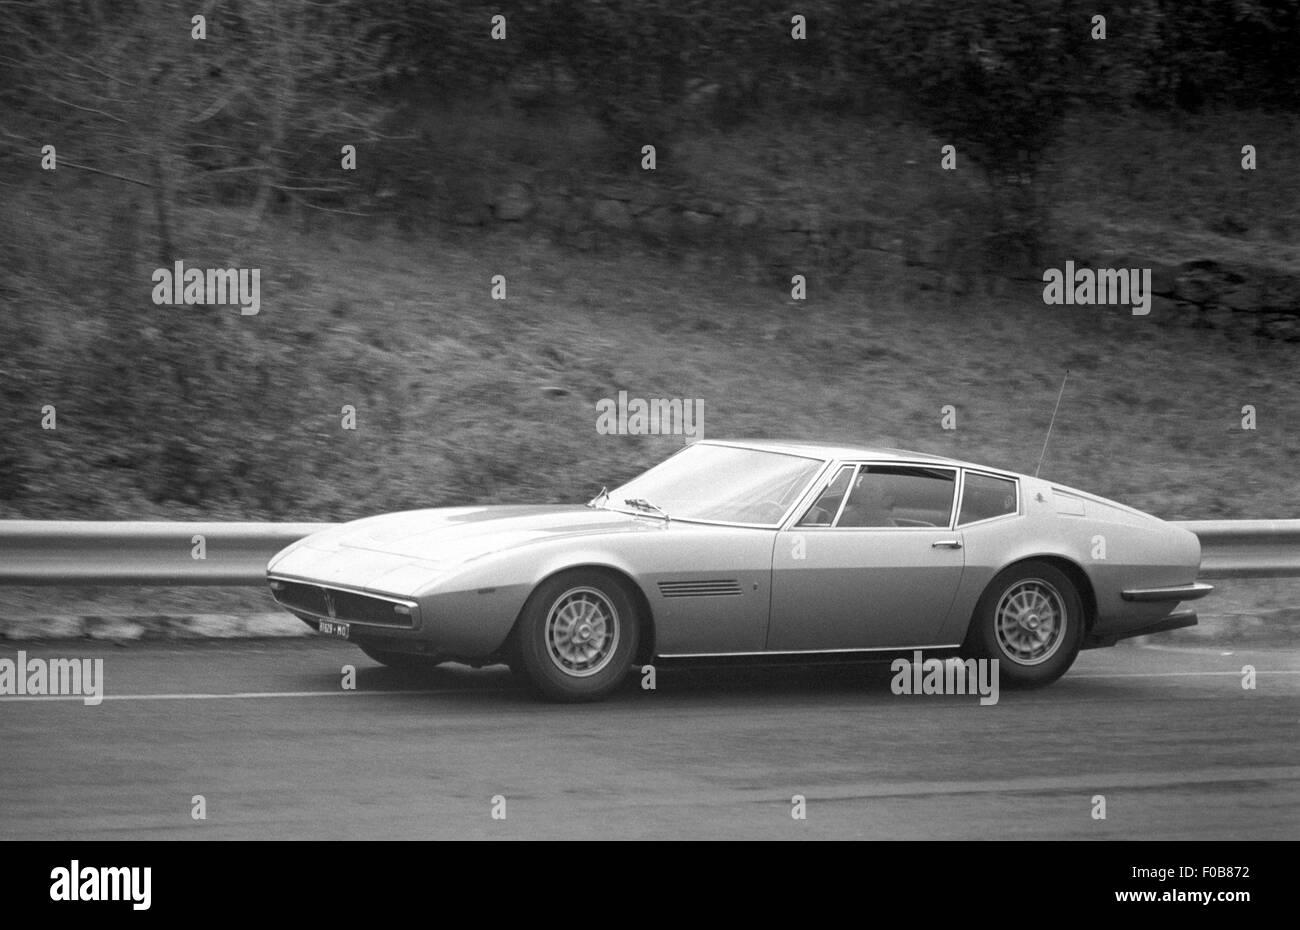 Maserati Ghibli production Gran Turismo in action - Stock Image